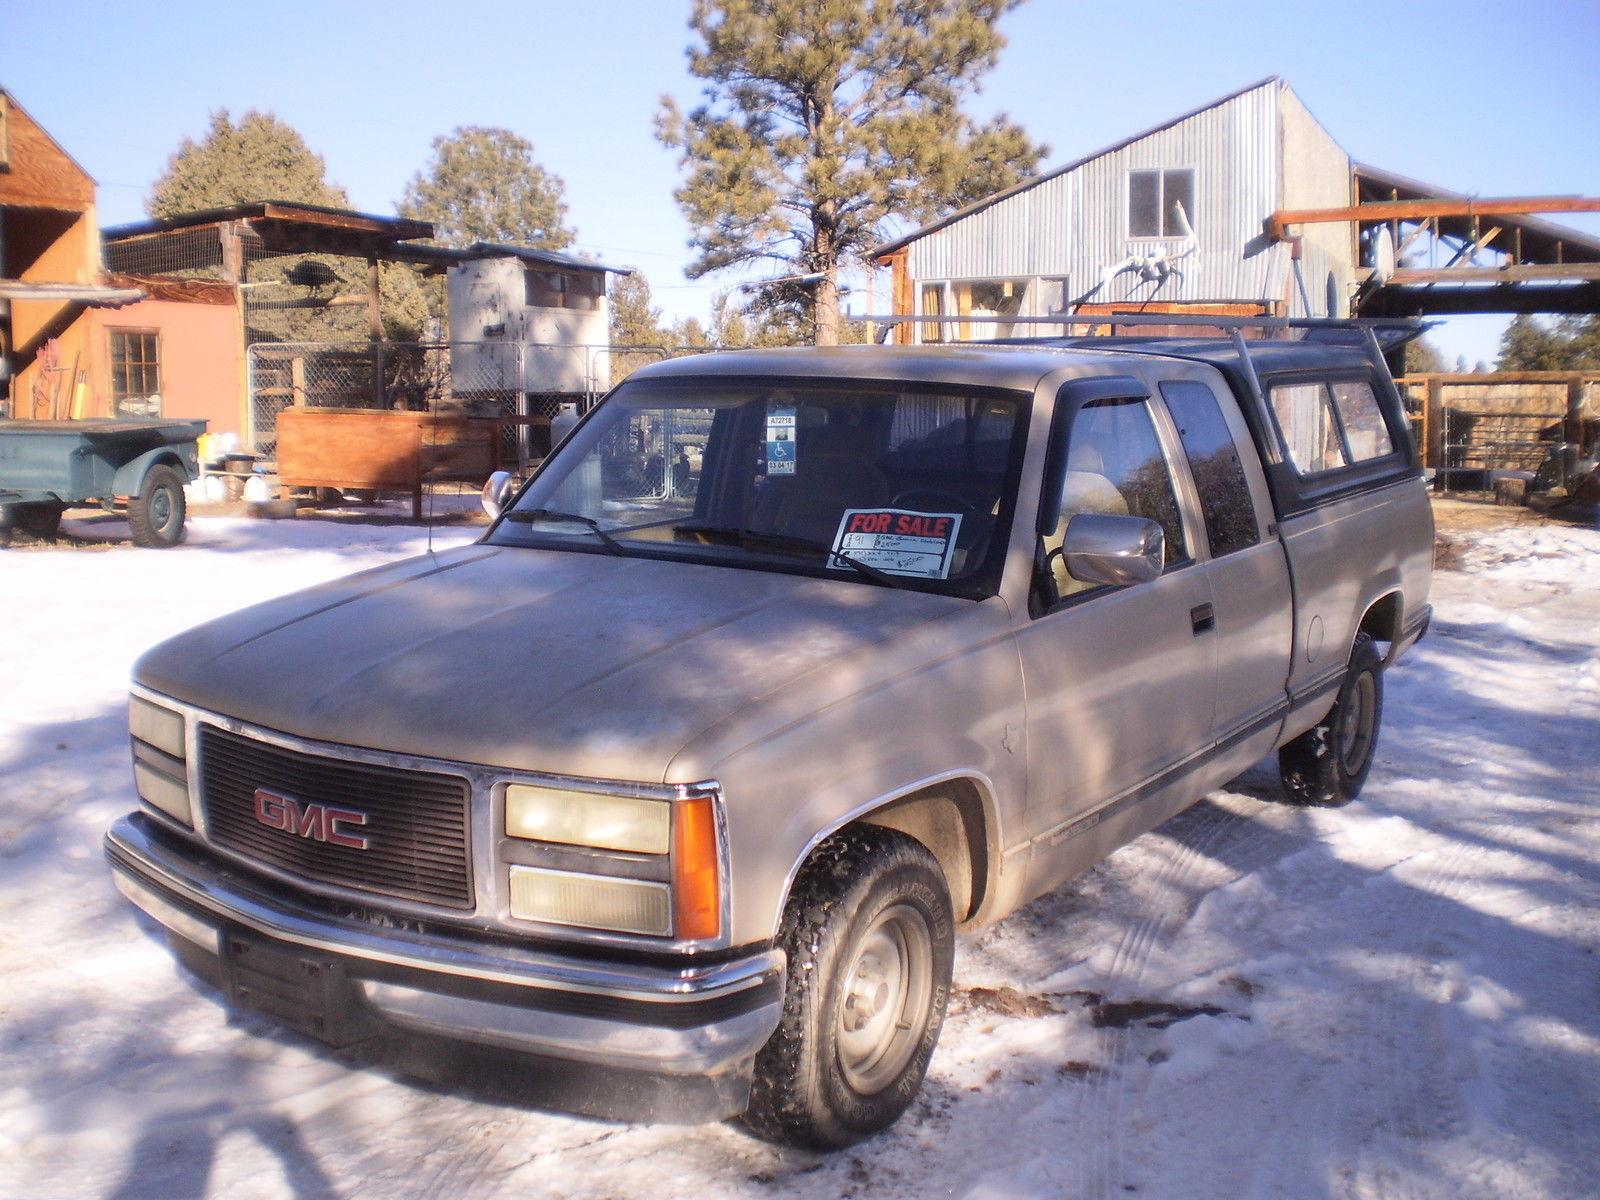 1991 Gmc Sierra Sle1500 Crew Cab Classic 4x2 Not Chevy K1500 Or 3500 Chevrolet Prevnext